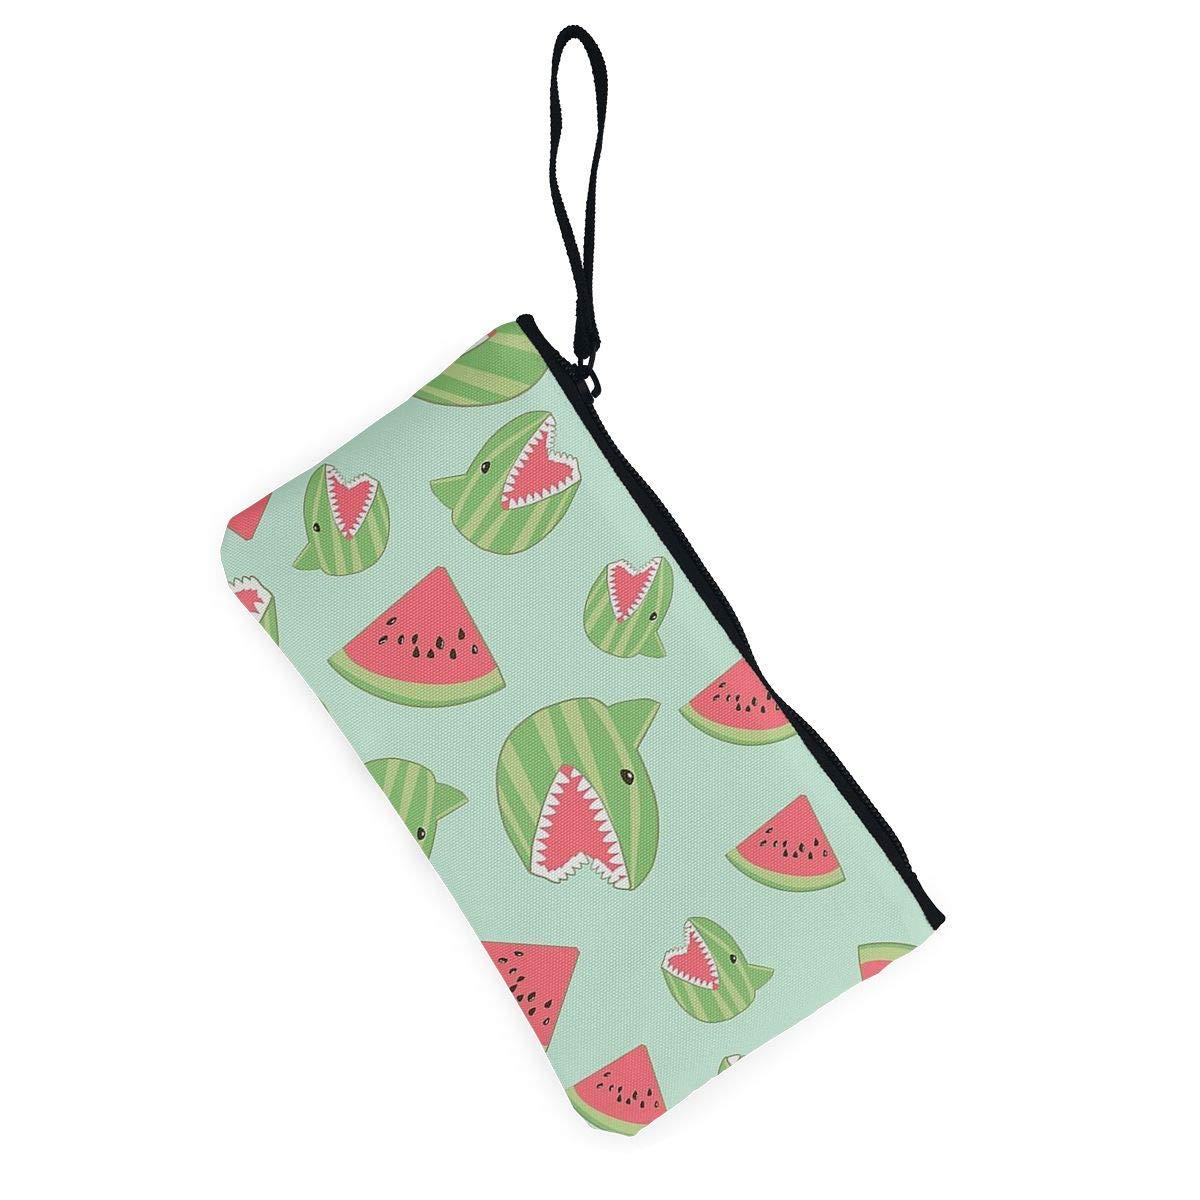 Coin Pouch Shark Watermelon Canvas Coin Purse Cellphone Card Bag With Handle And Zipper